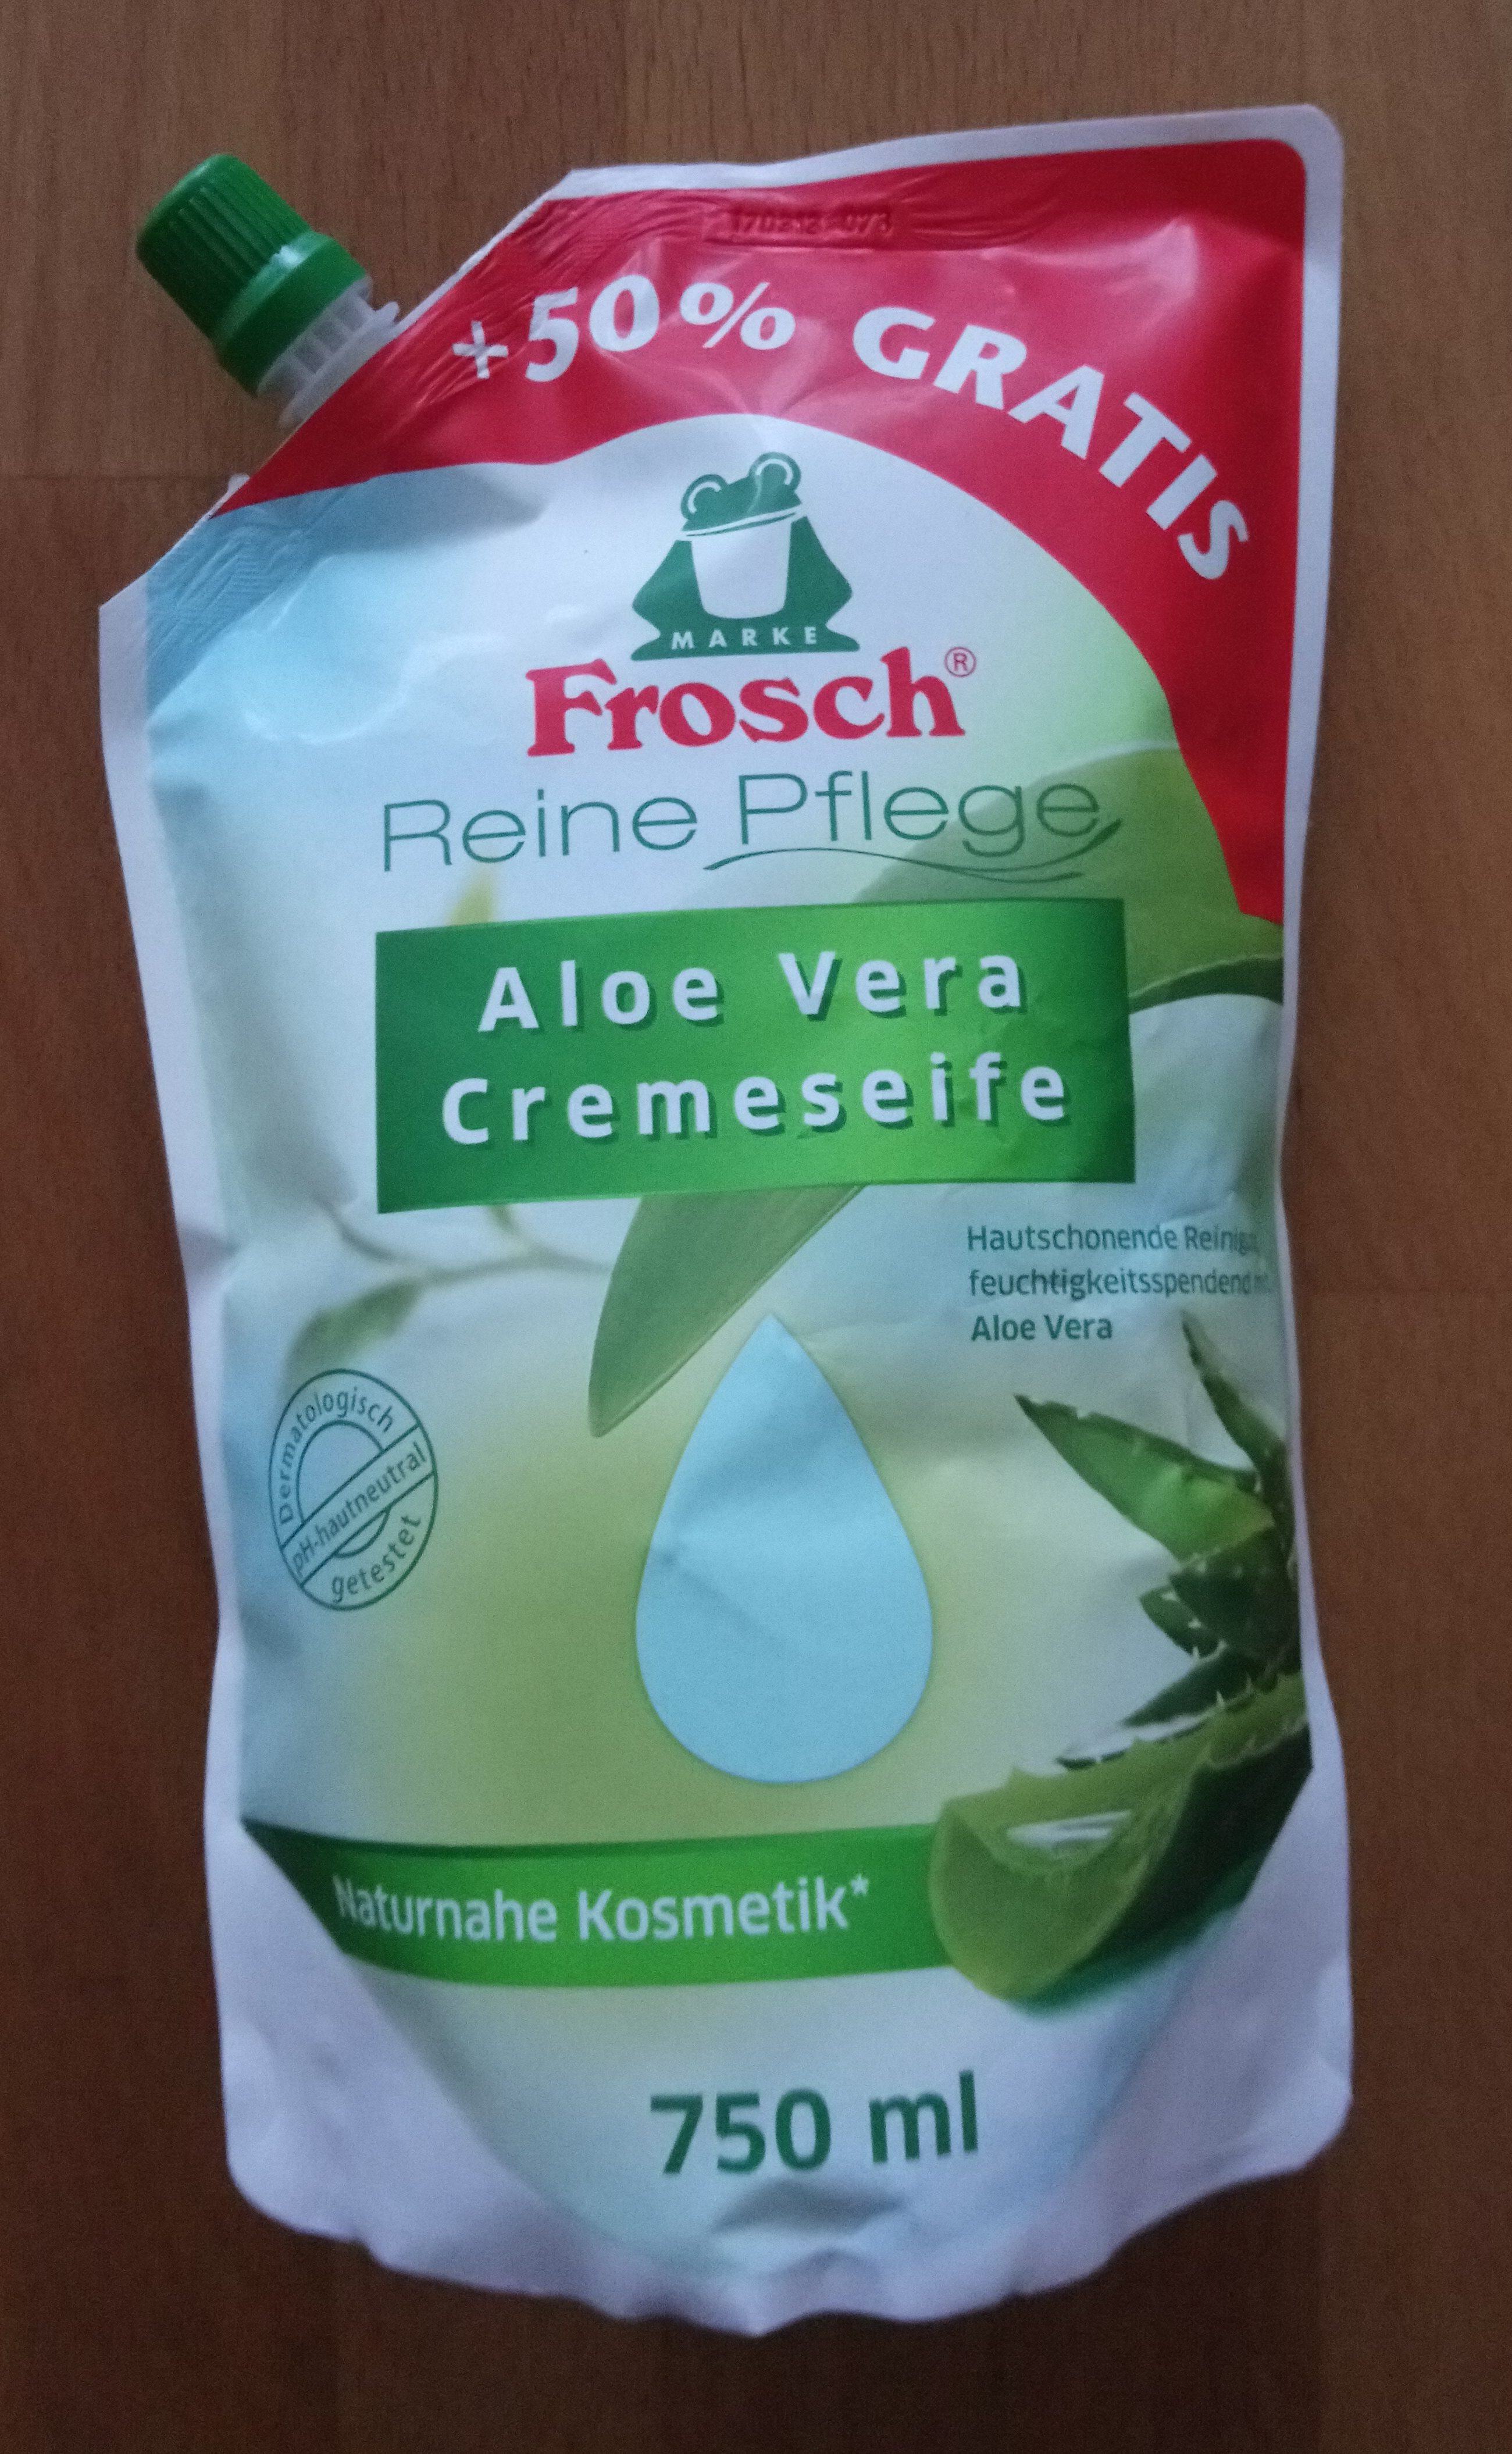 Aloe Vera Cremeseife - Product